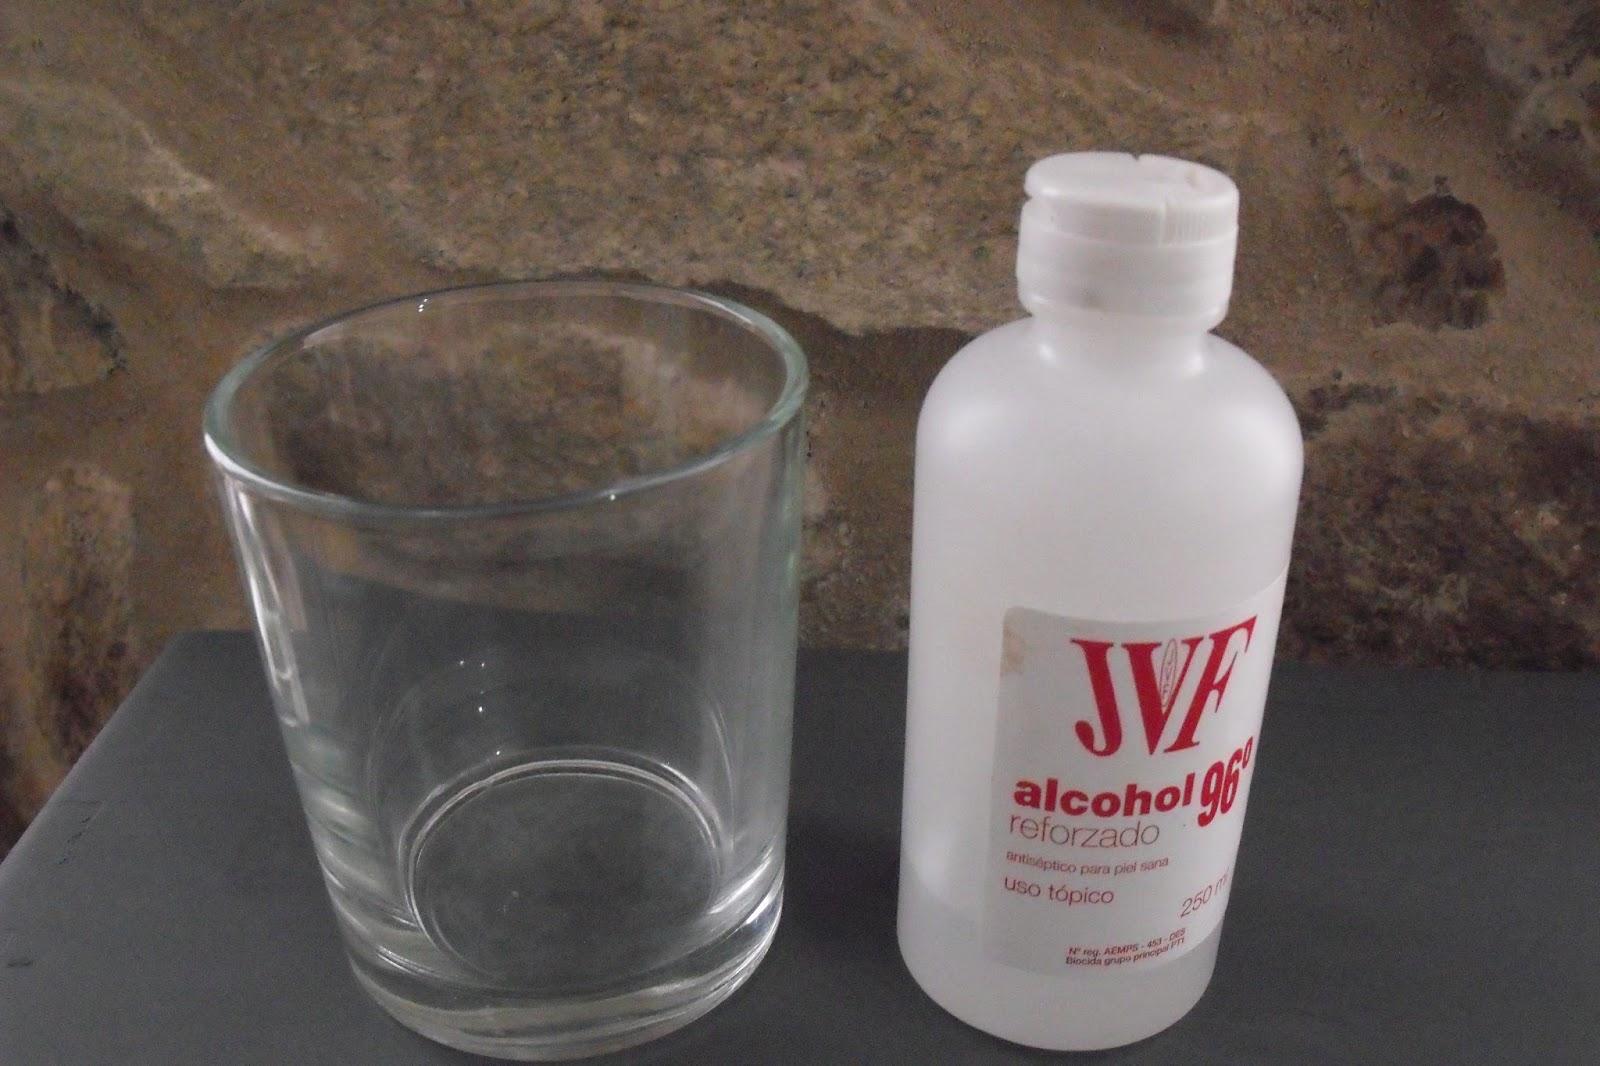 Lascosasdeleni grabando cristal con cido - Limpiar con alcohol ...